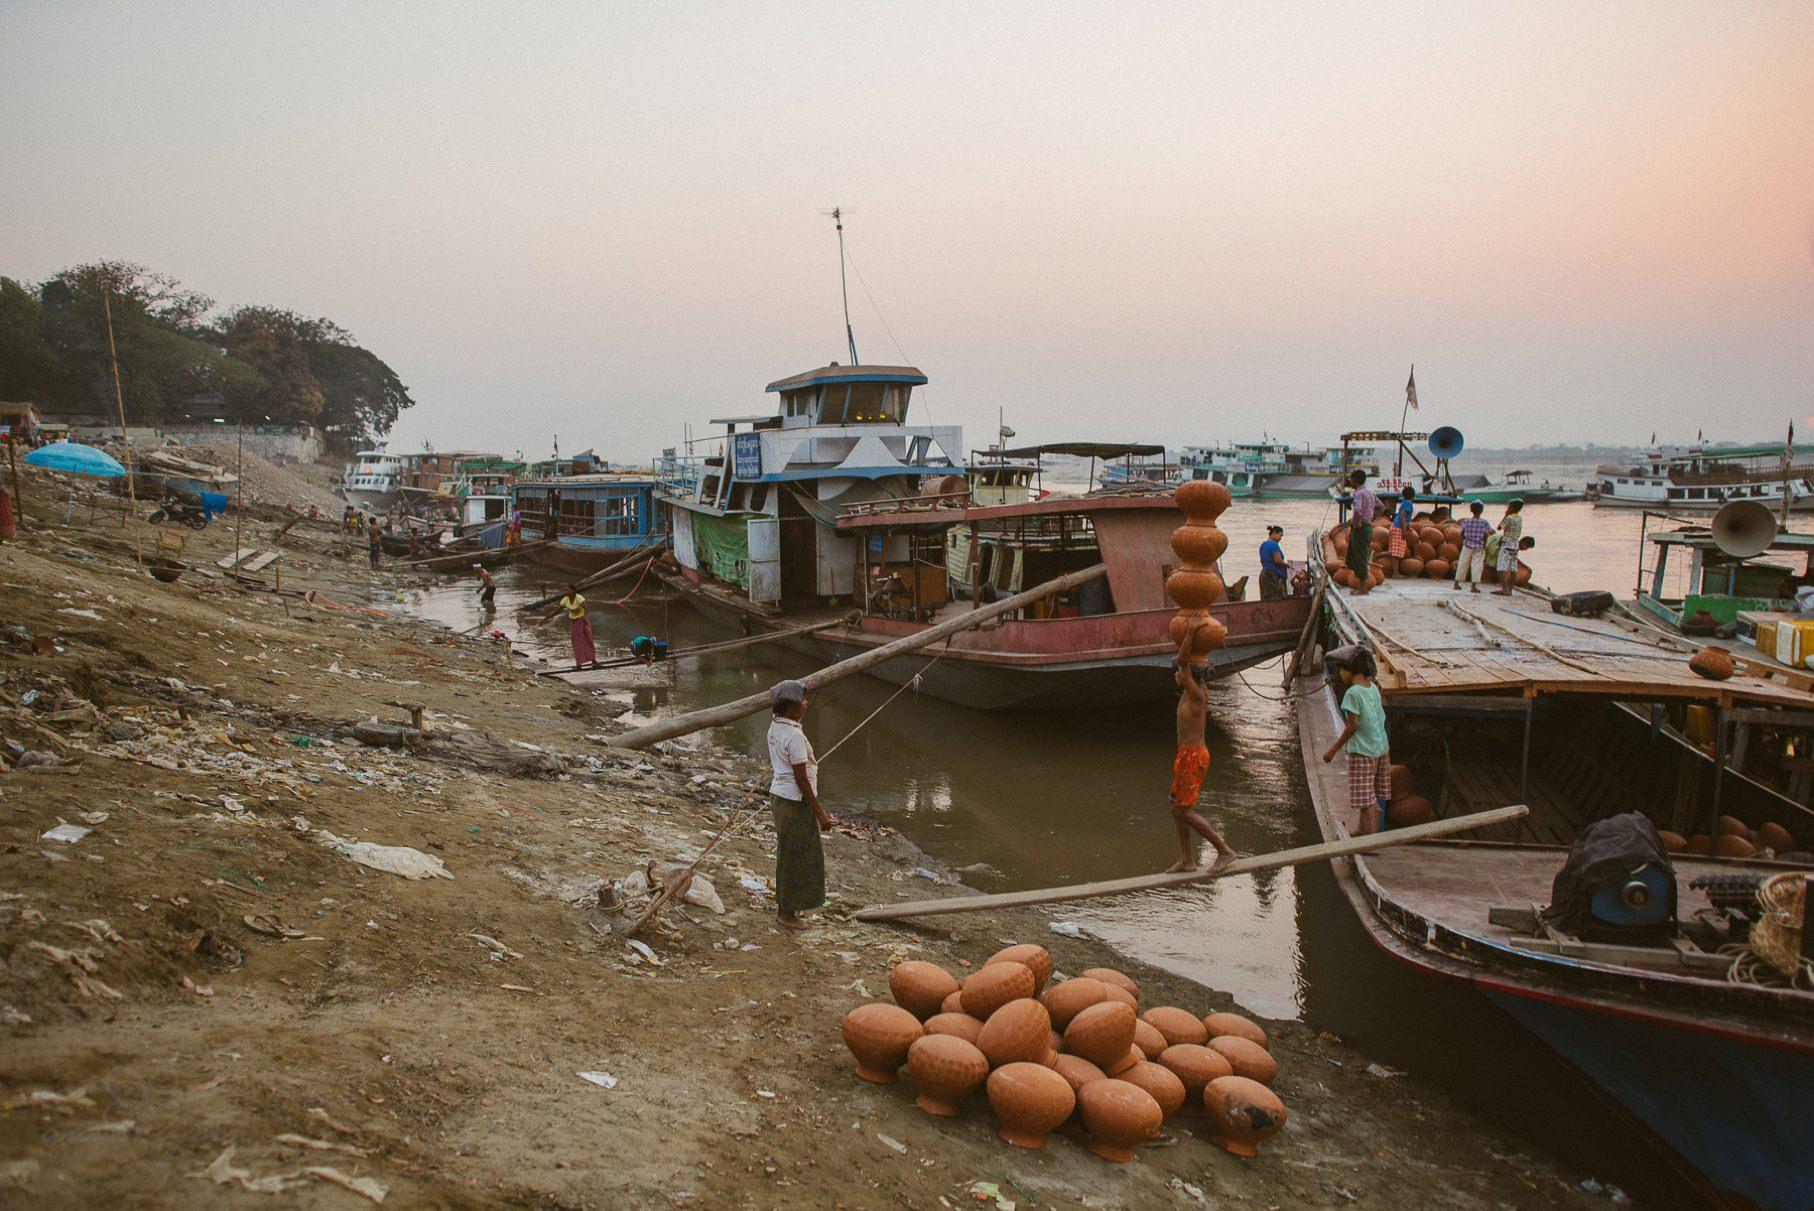 0066 yangon mandalay d76 7117 - Großstädte Myanmars - Yangon & Mandalay